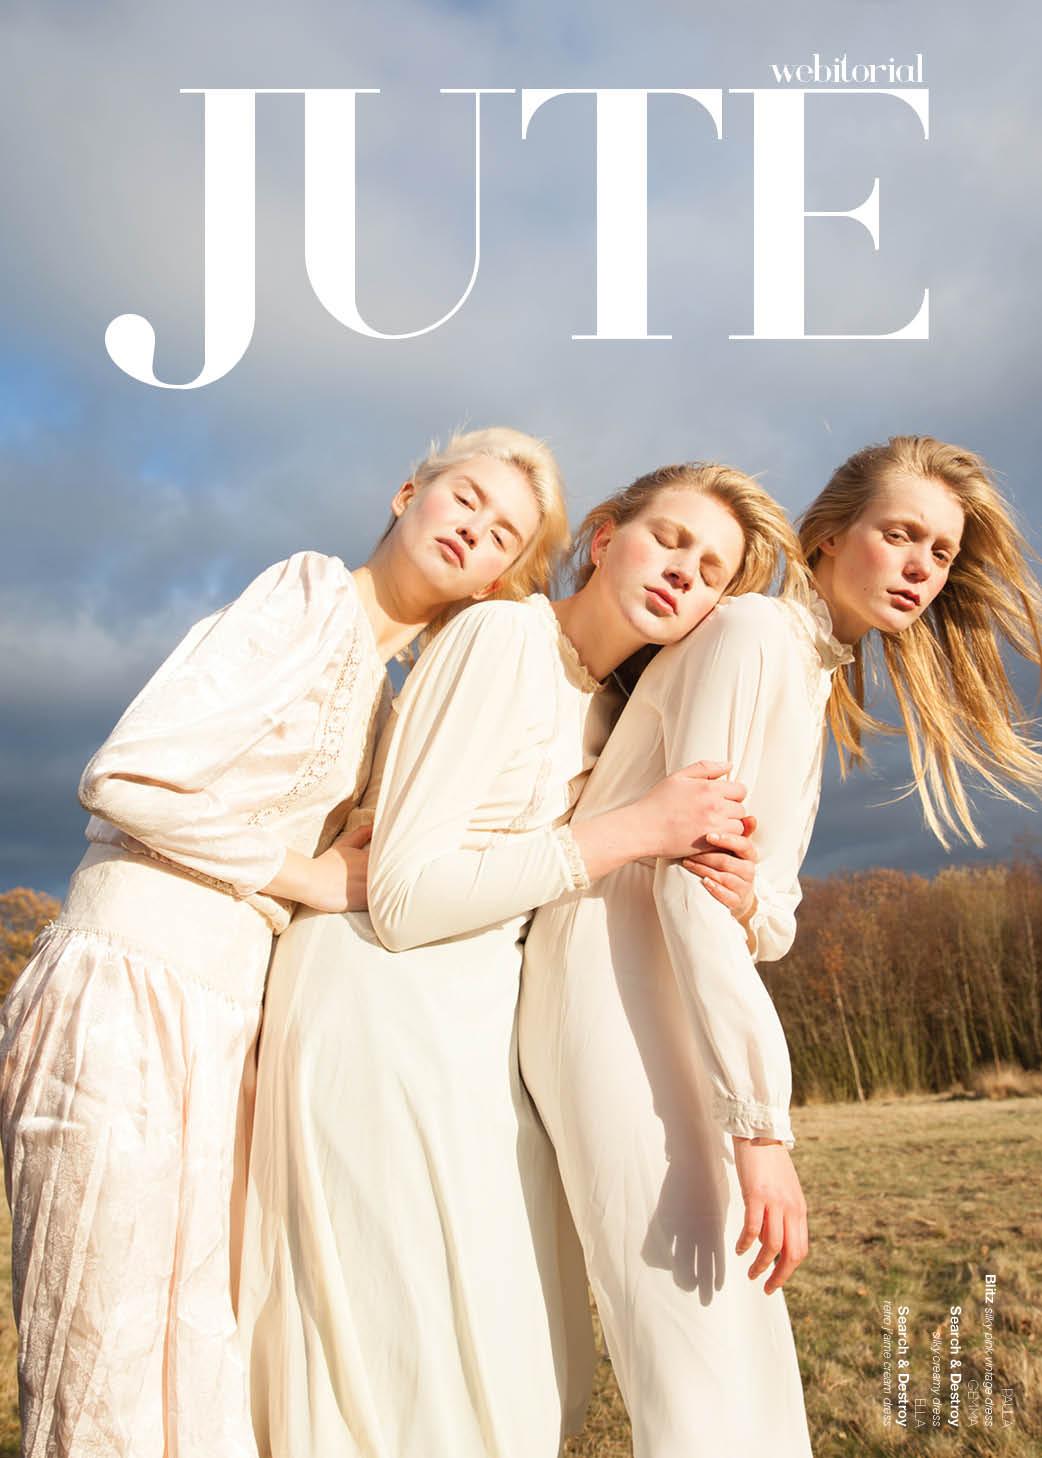 'Zephyr' - Jute Magazine